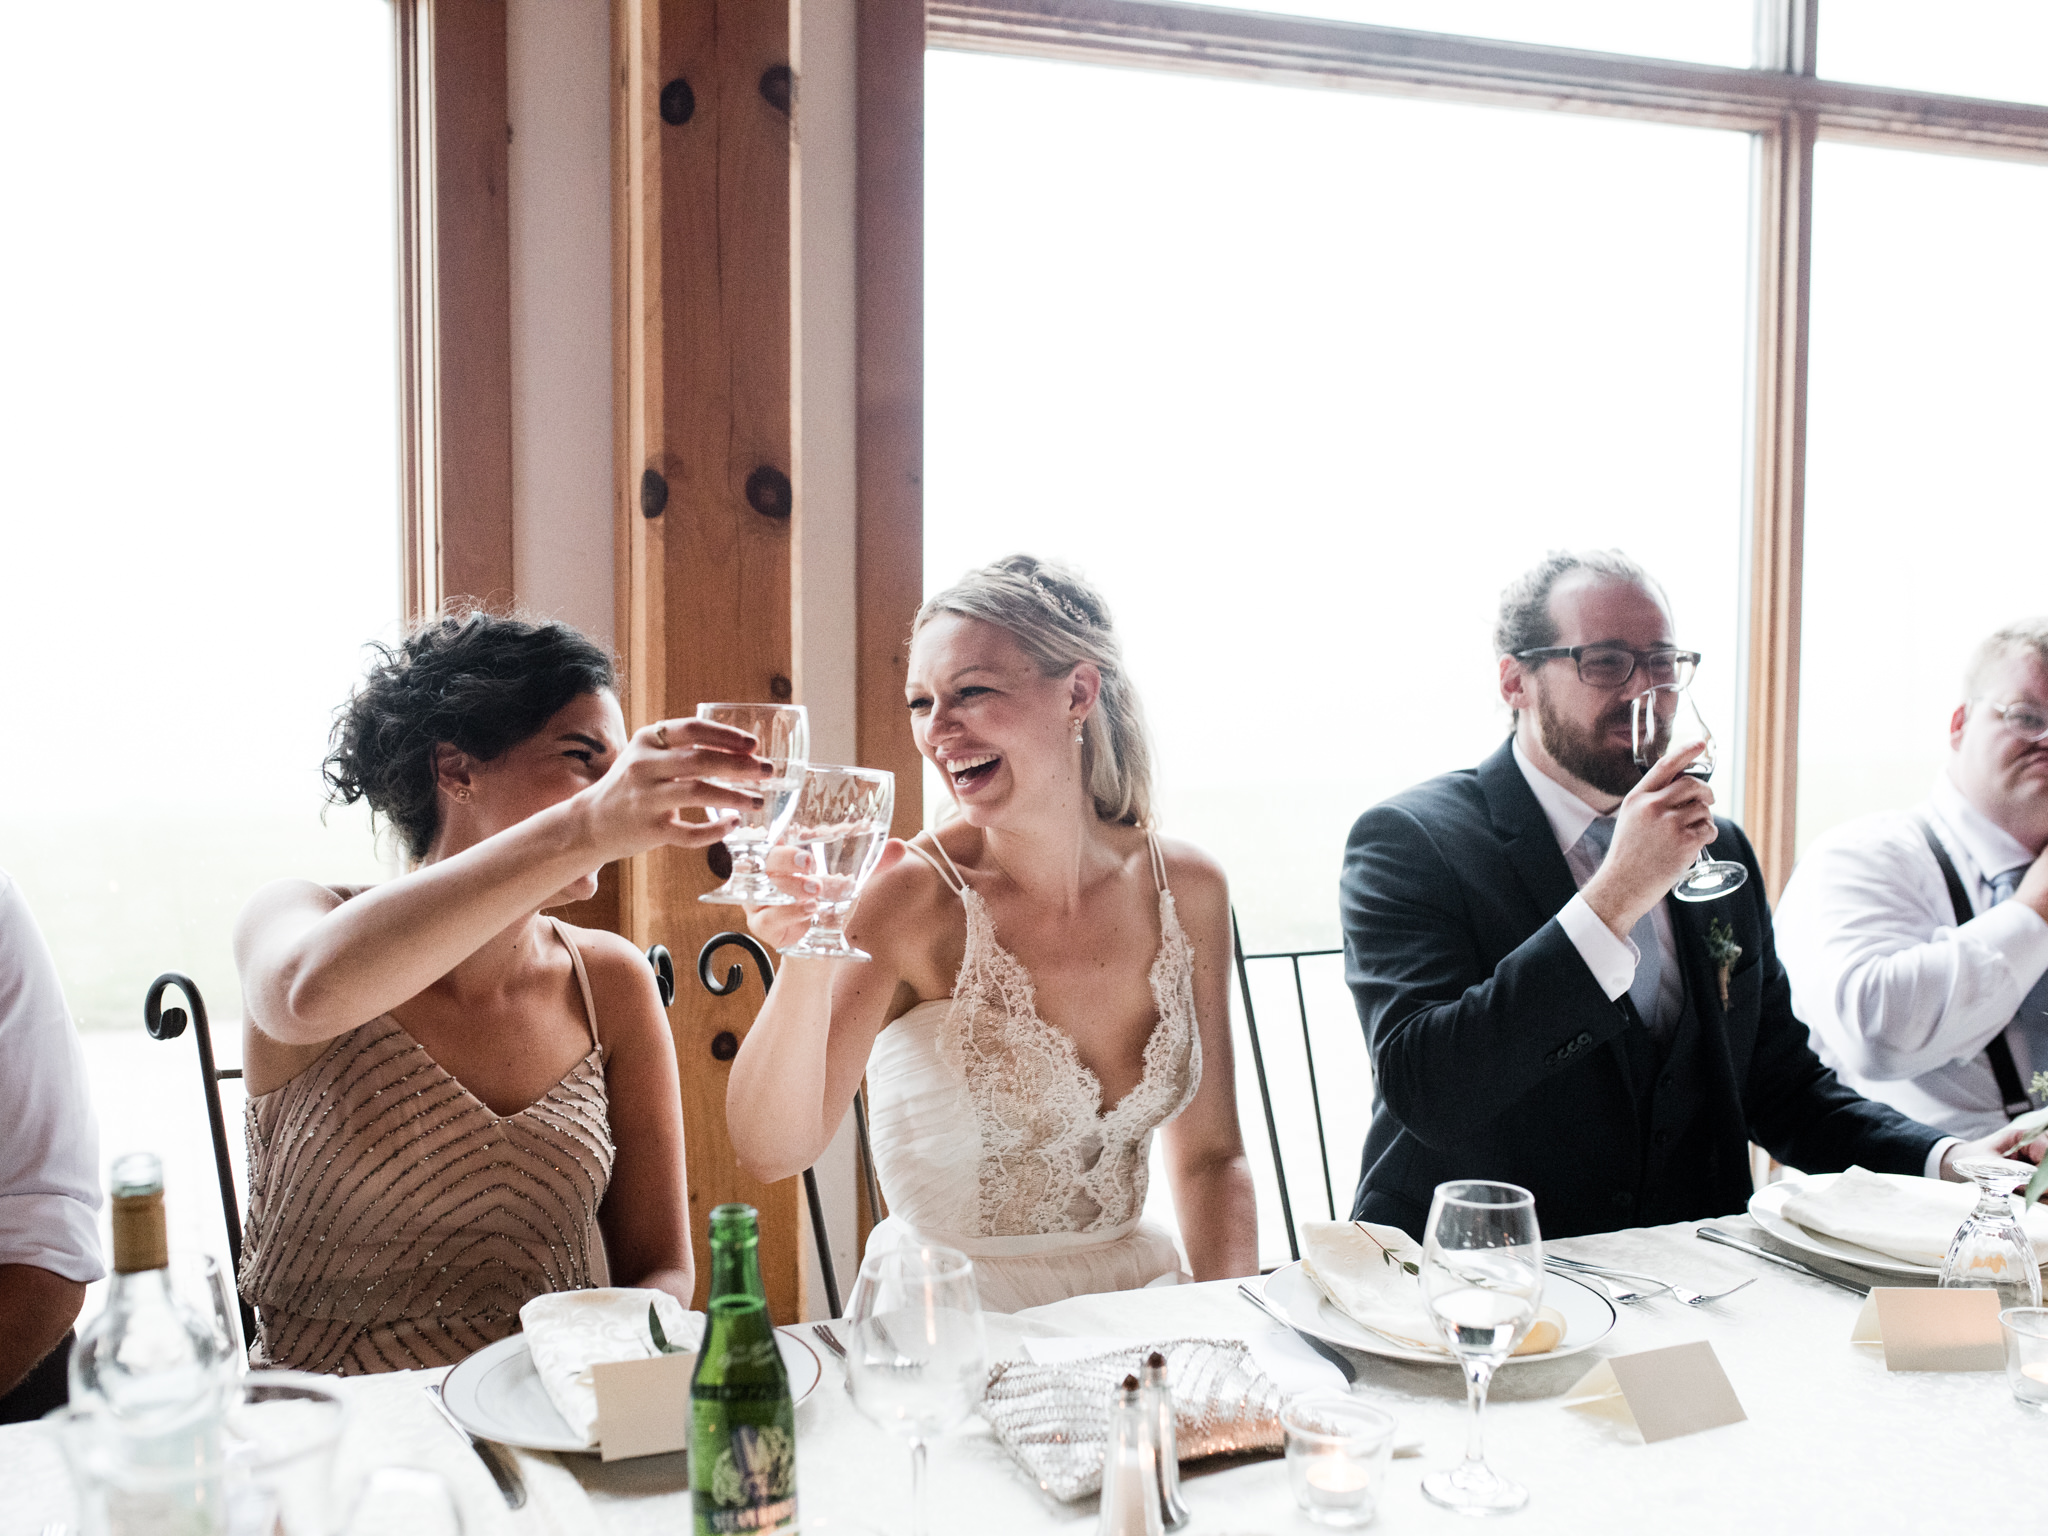 skyloft-wedding-toronto-wedding-photographer-62.jpg